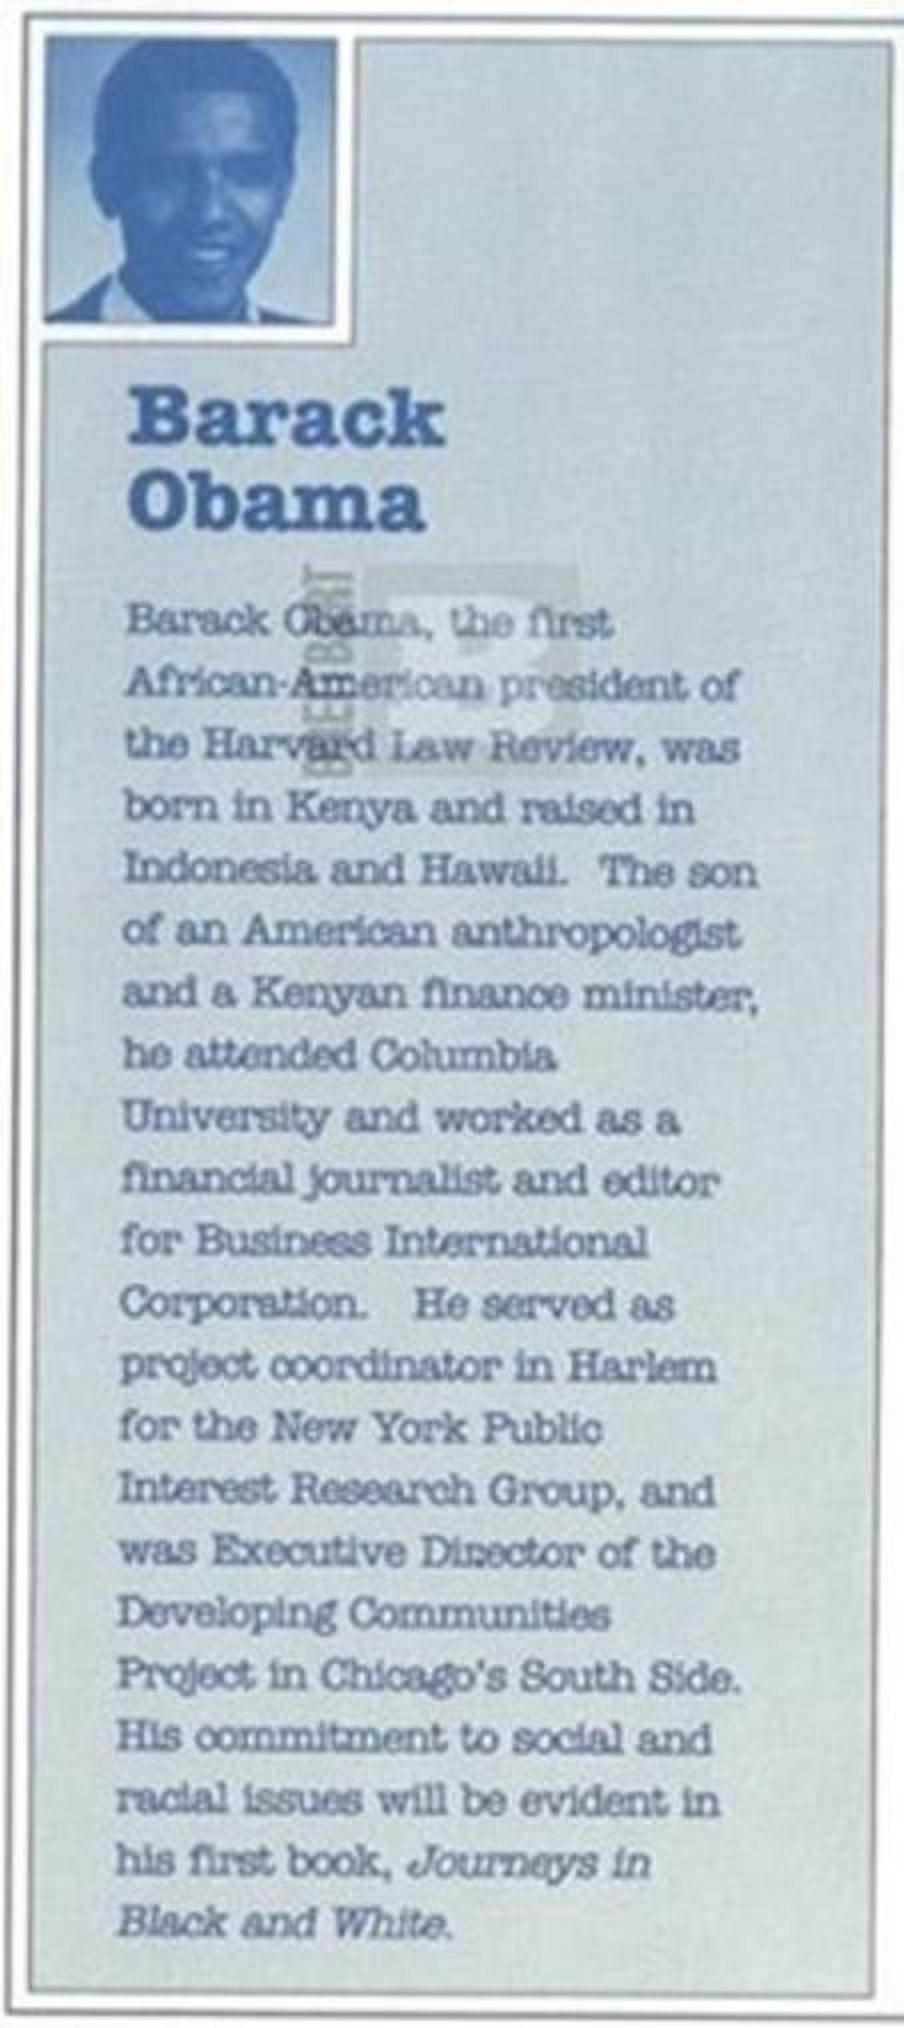 harvard law essay book 图书55 successful harvard law school application essays 介绍、书评、论坛及推荐.